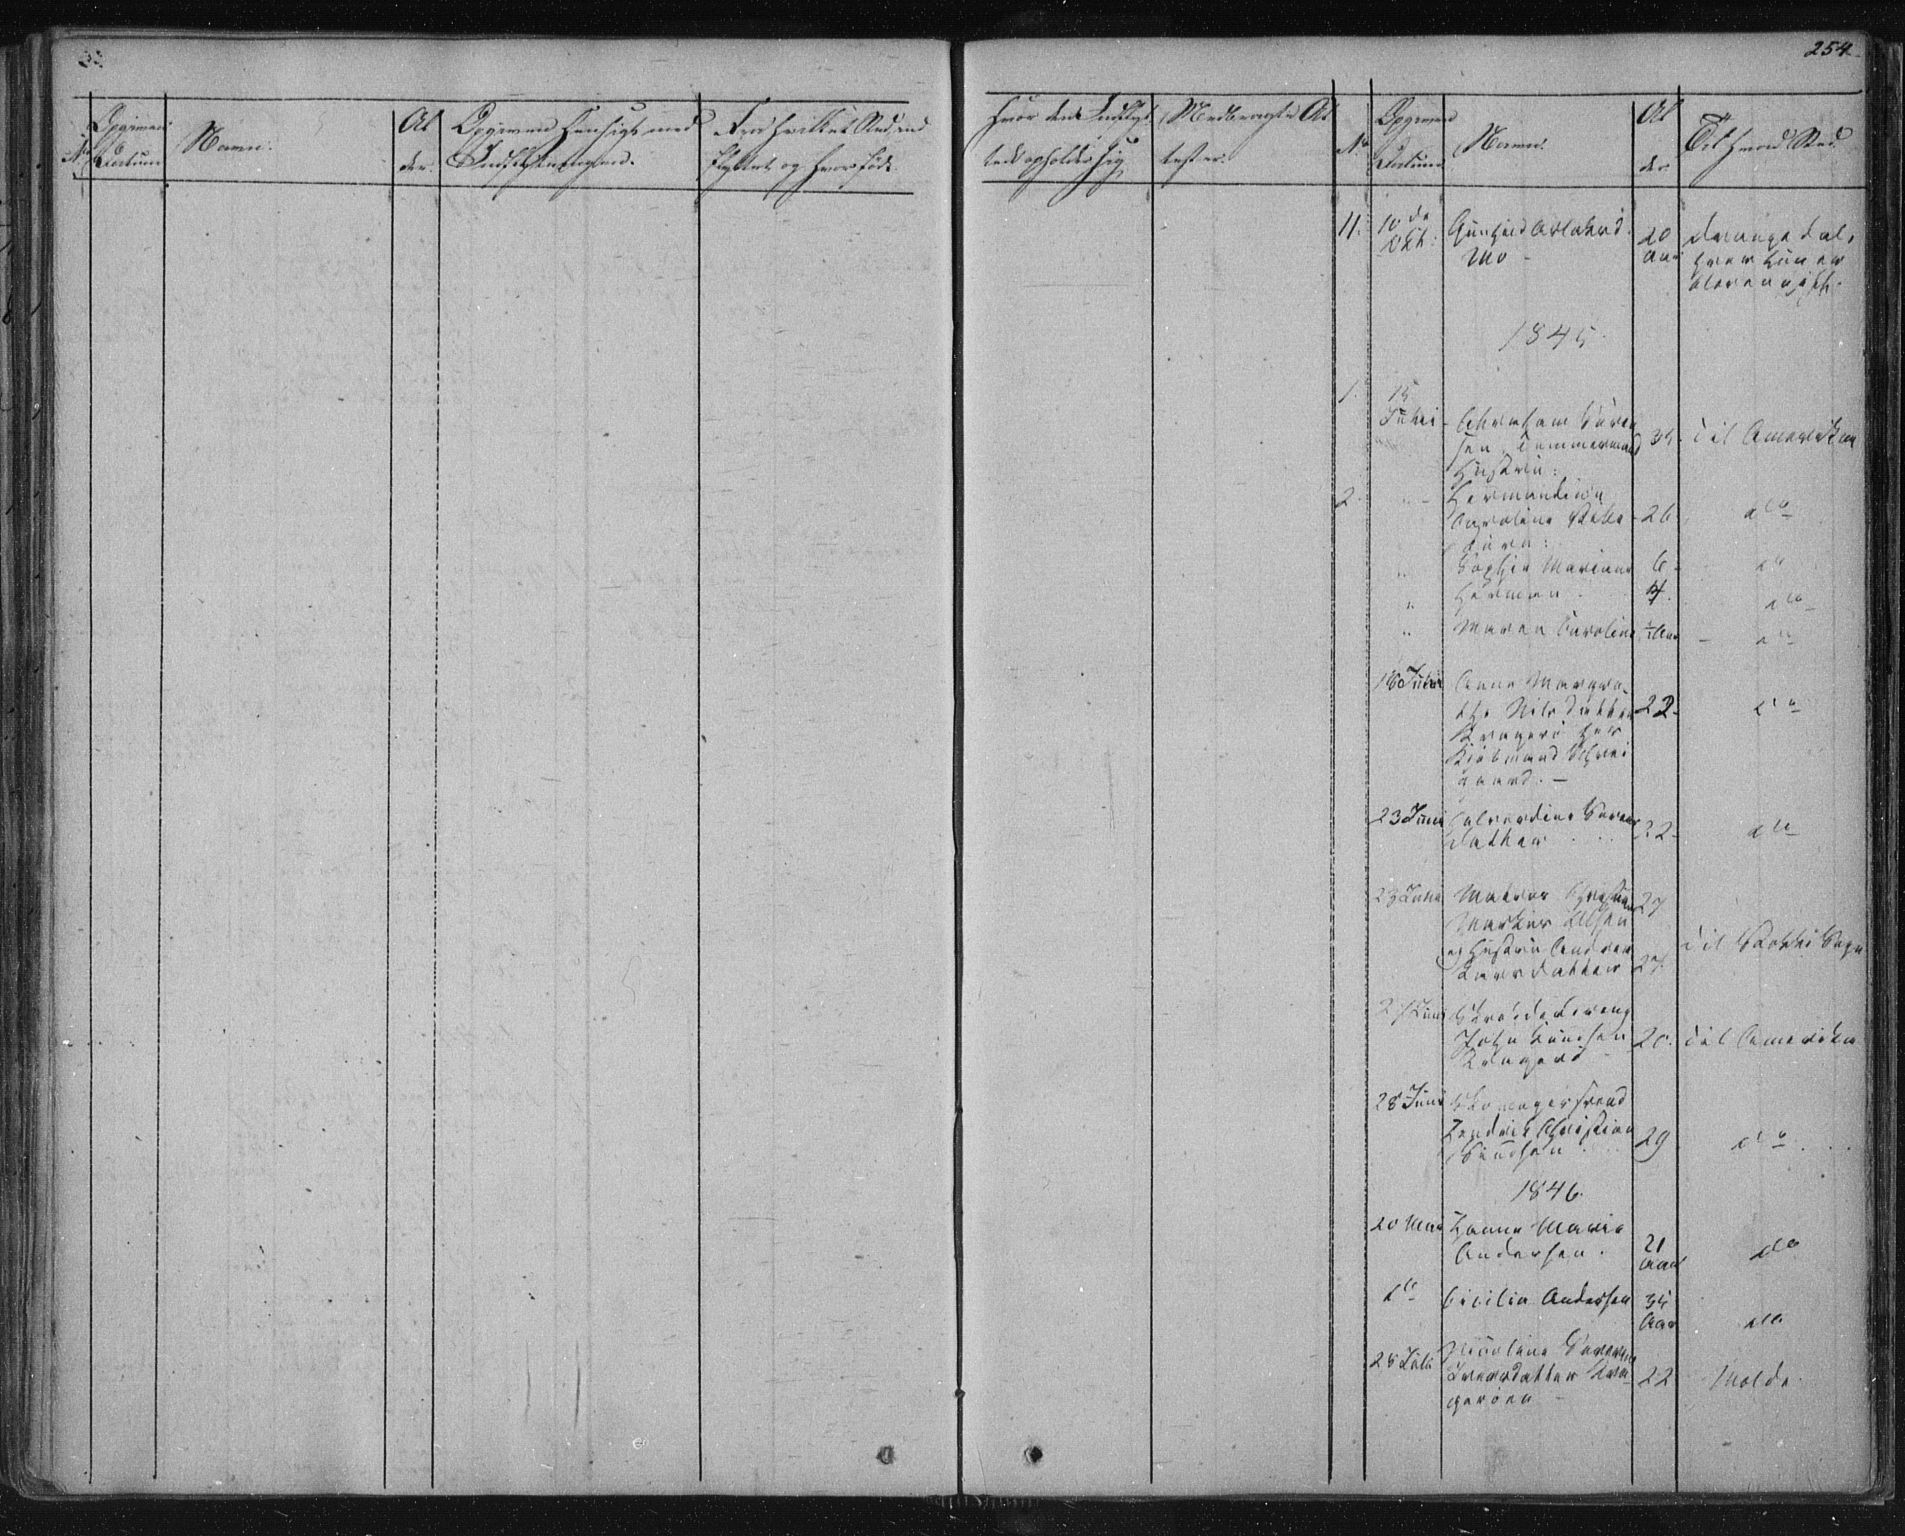 SAKO, Kragerø kirkebøker, F/Fa/L0005: Ministerialbok nr. 5, 1832-1847, s. 254